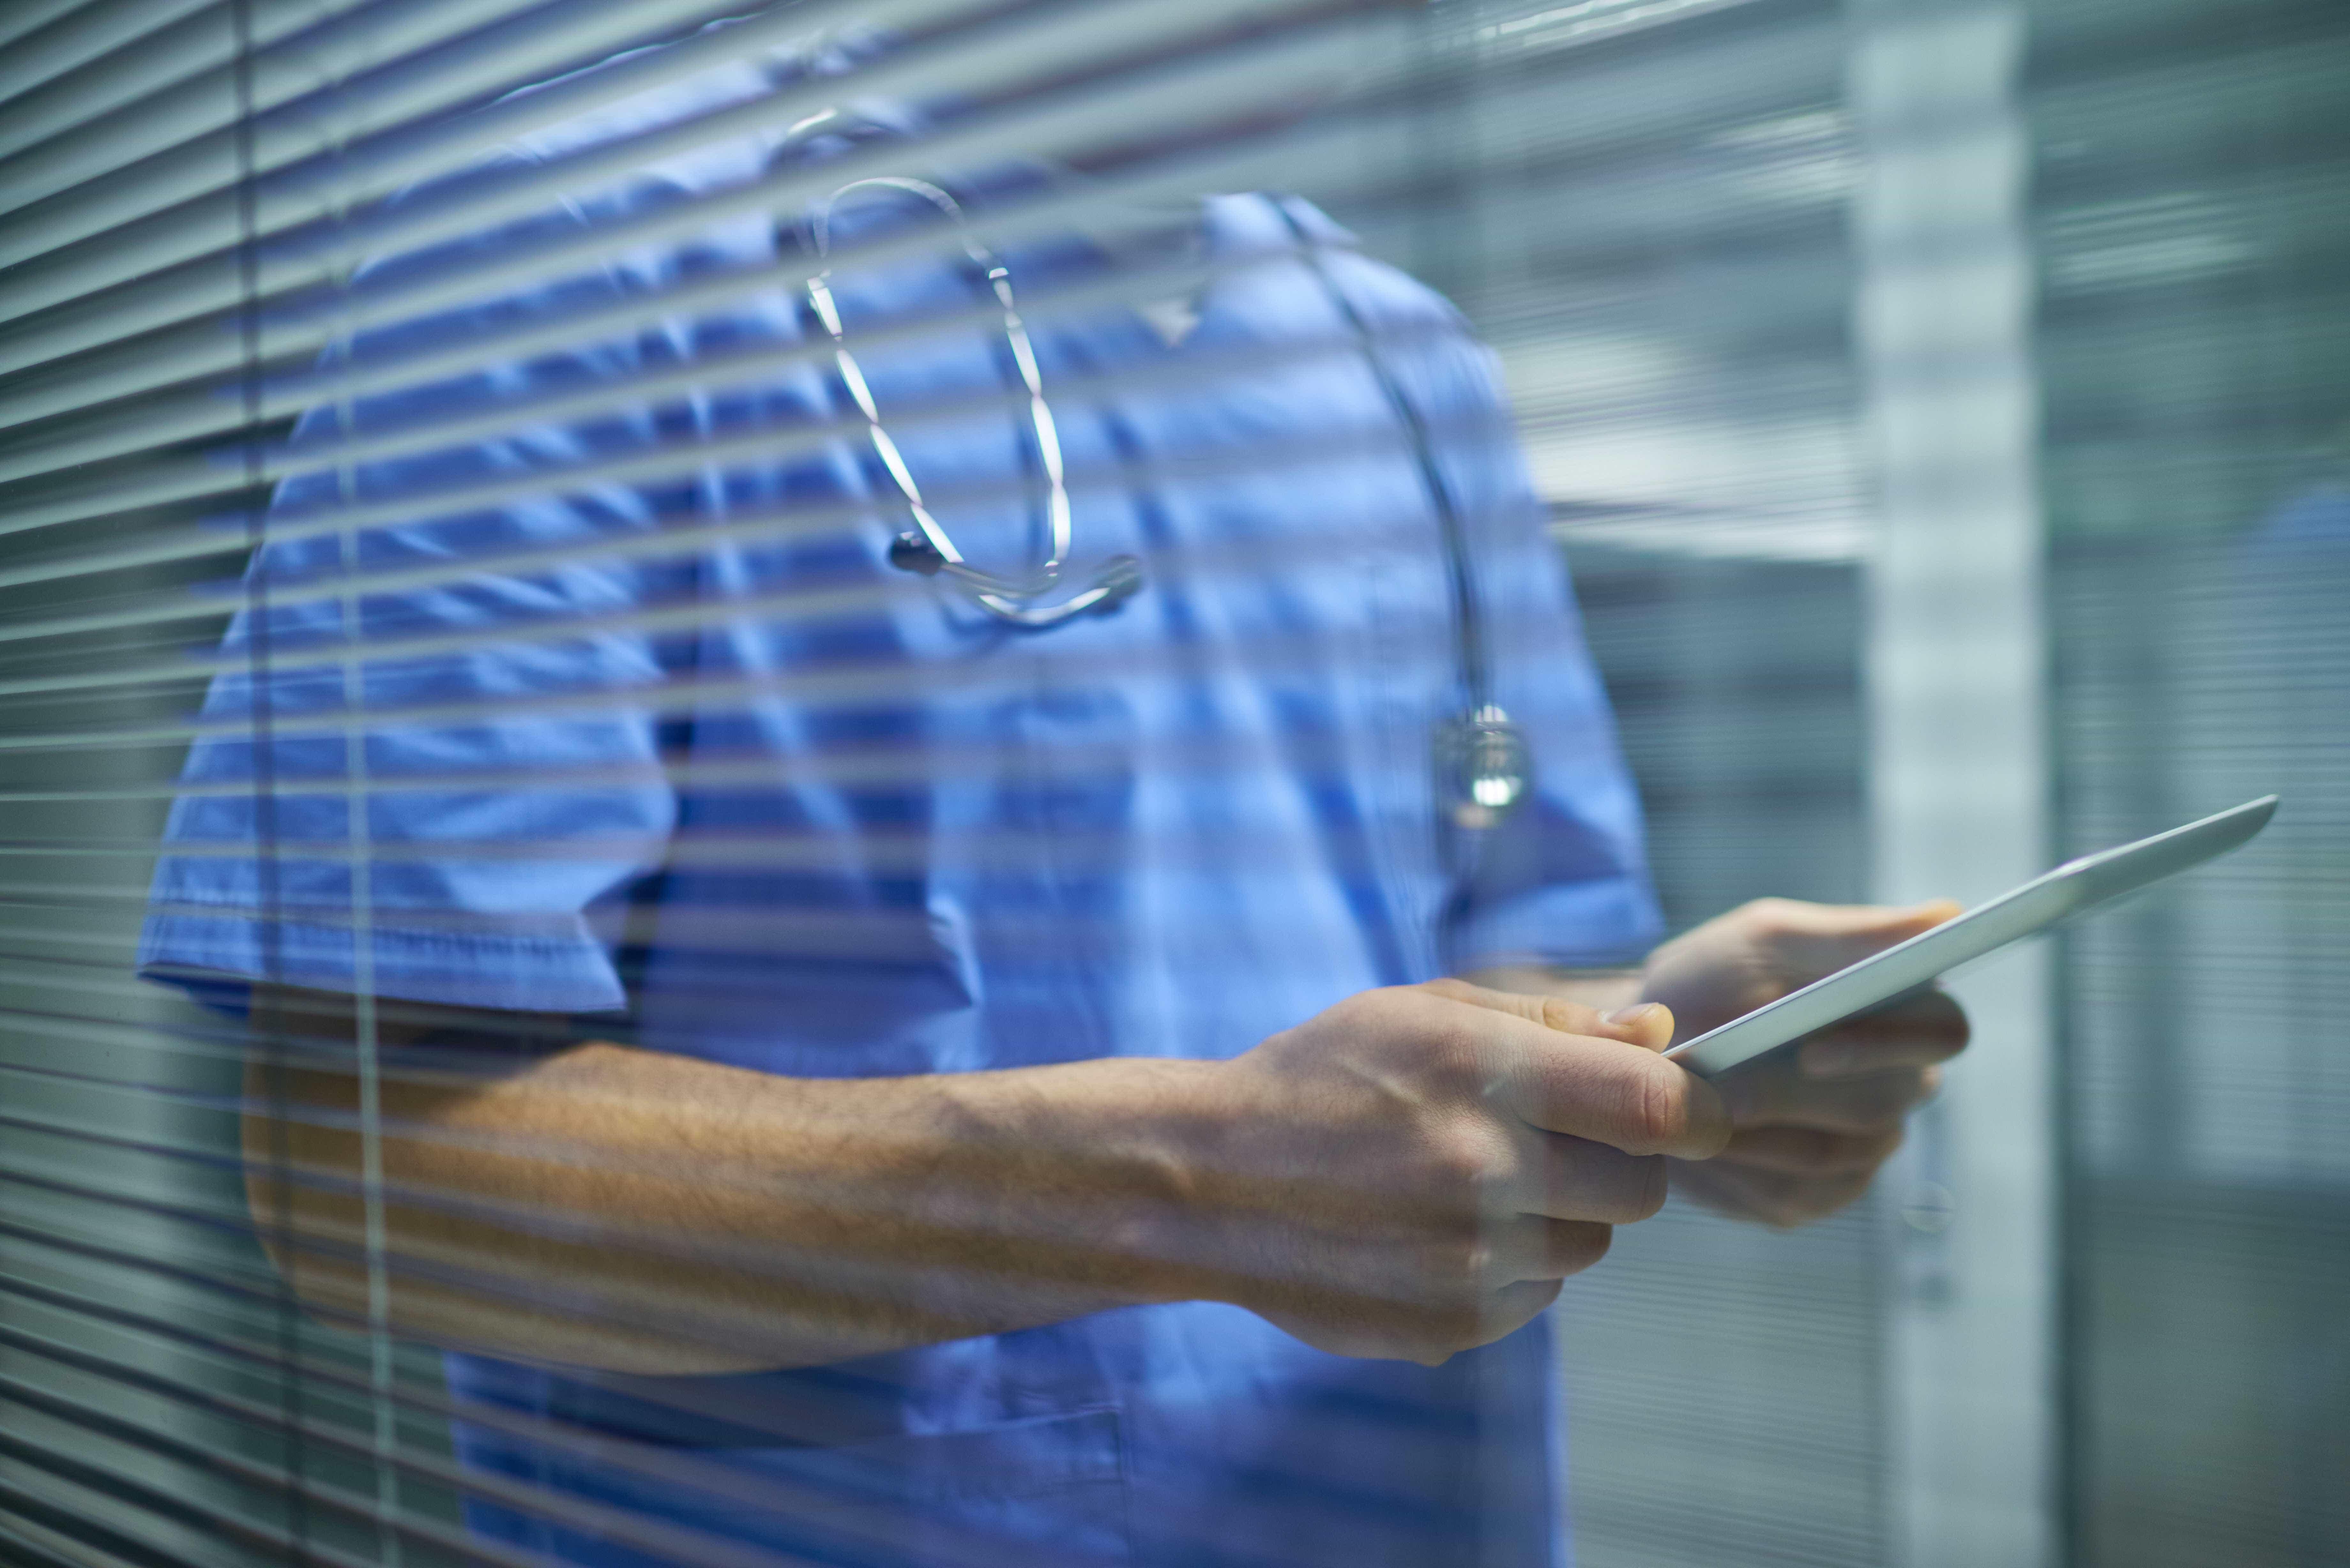 Desconvocada greve prolongada de enfermeiros nos blocos cirúrgicos